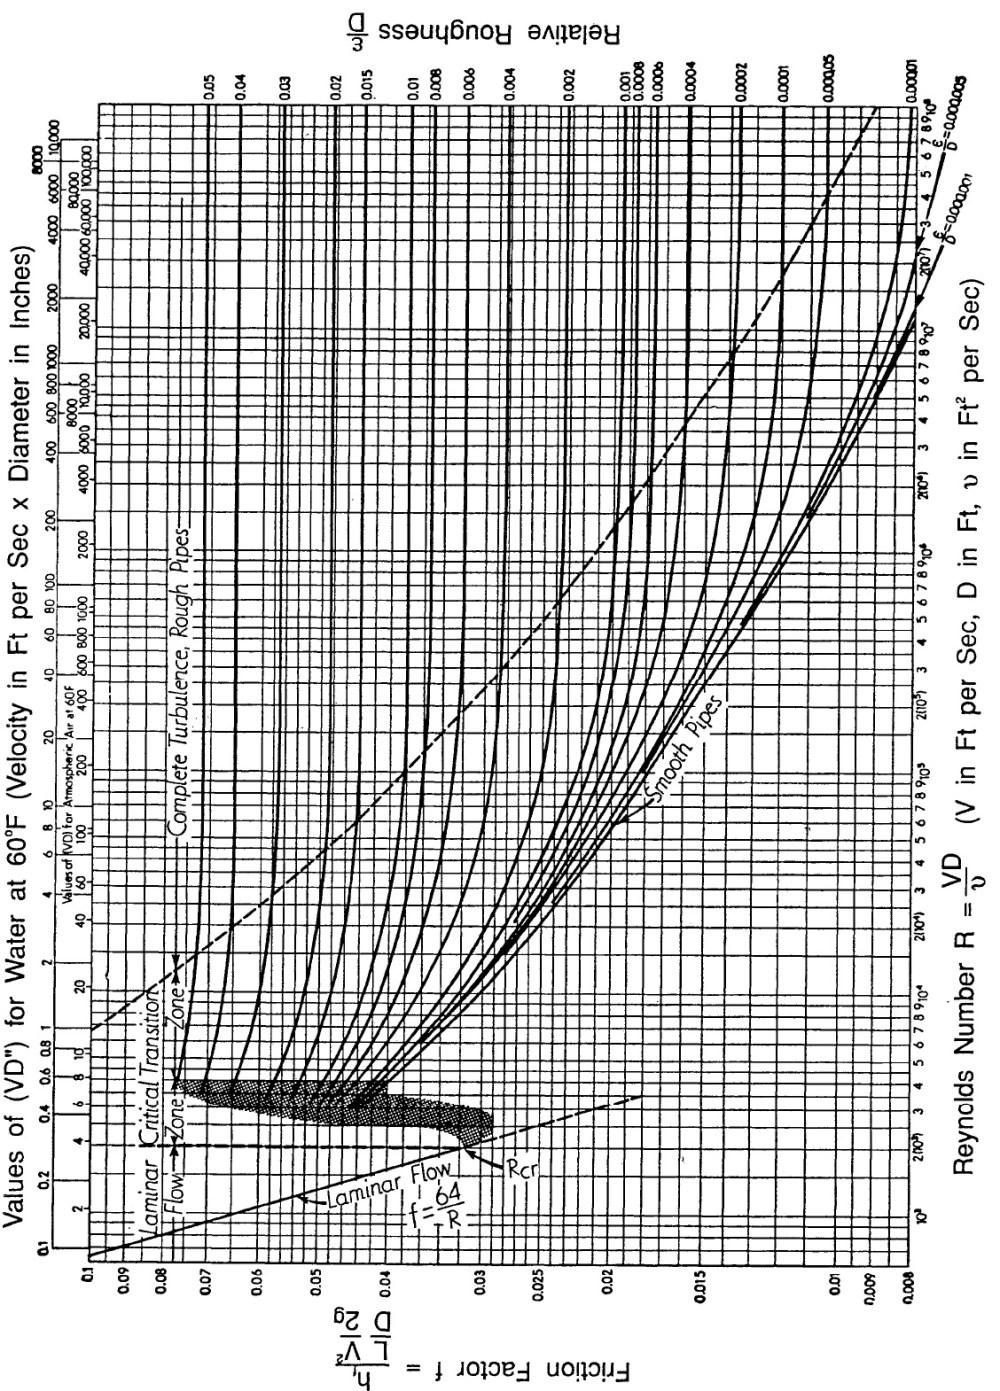 medium resolution of figure a moody chart